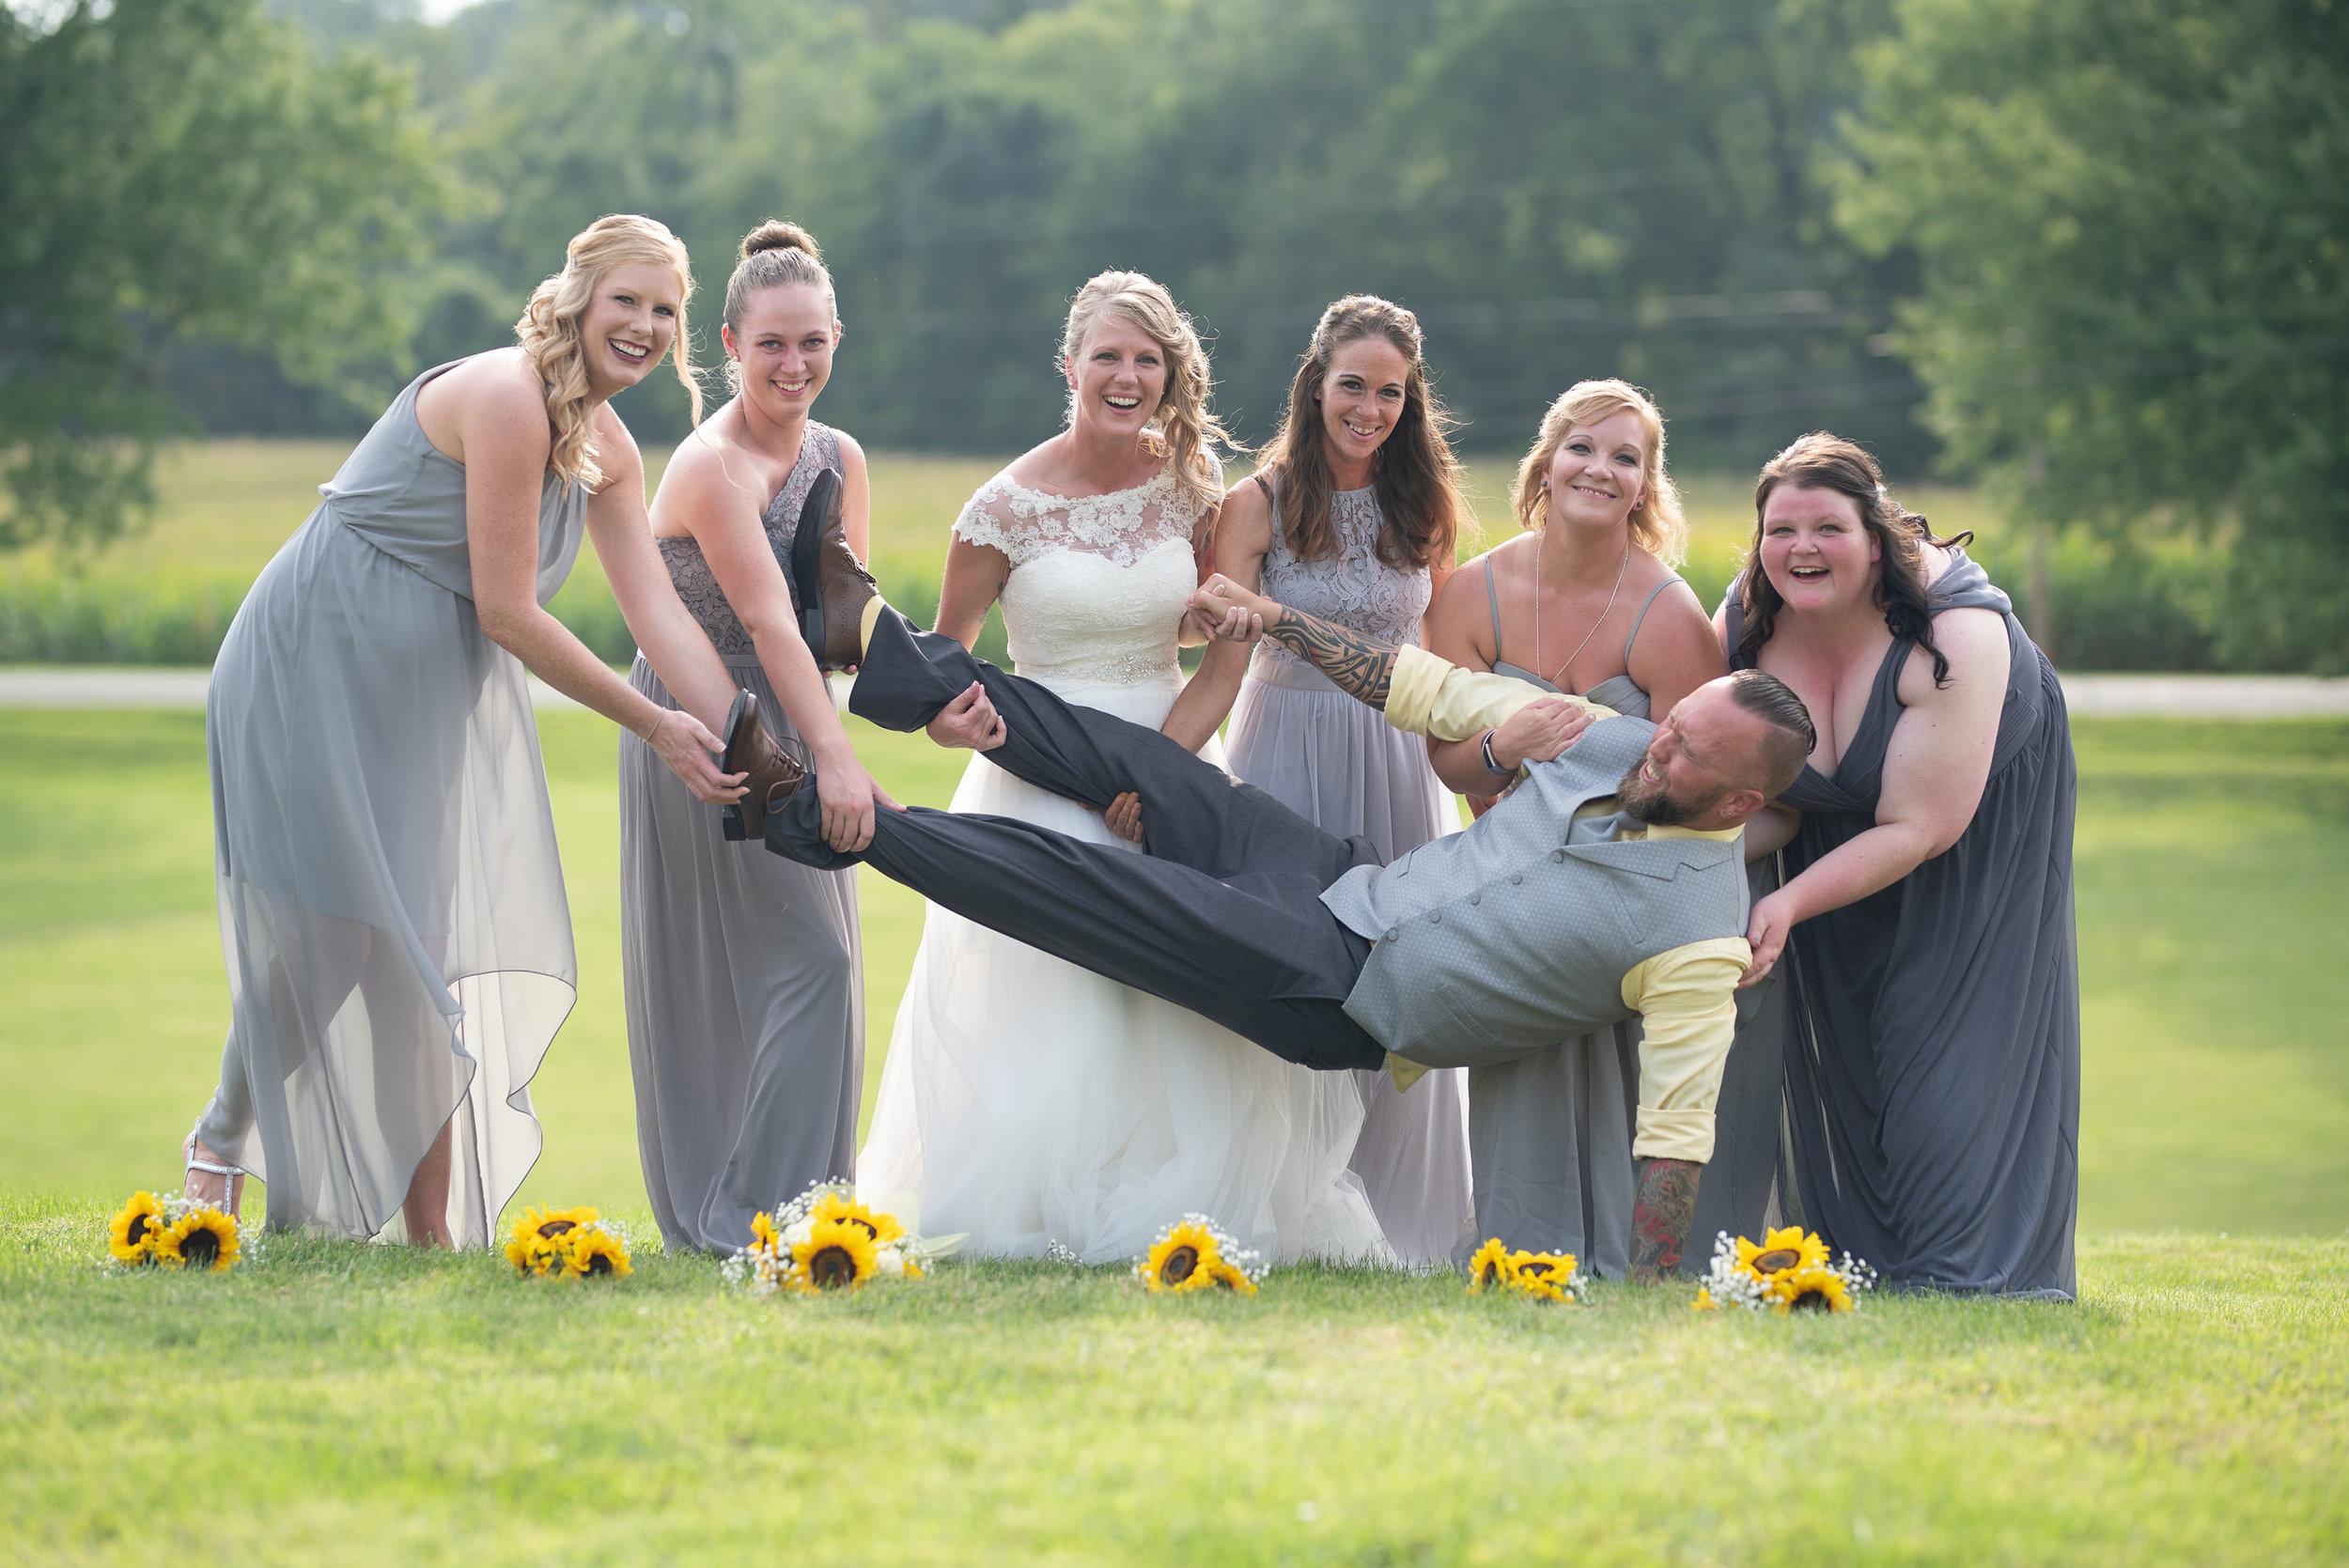 lancaster ohio wedding photographer fun bridal party photos